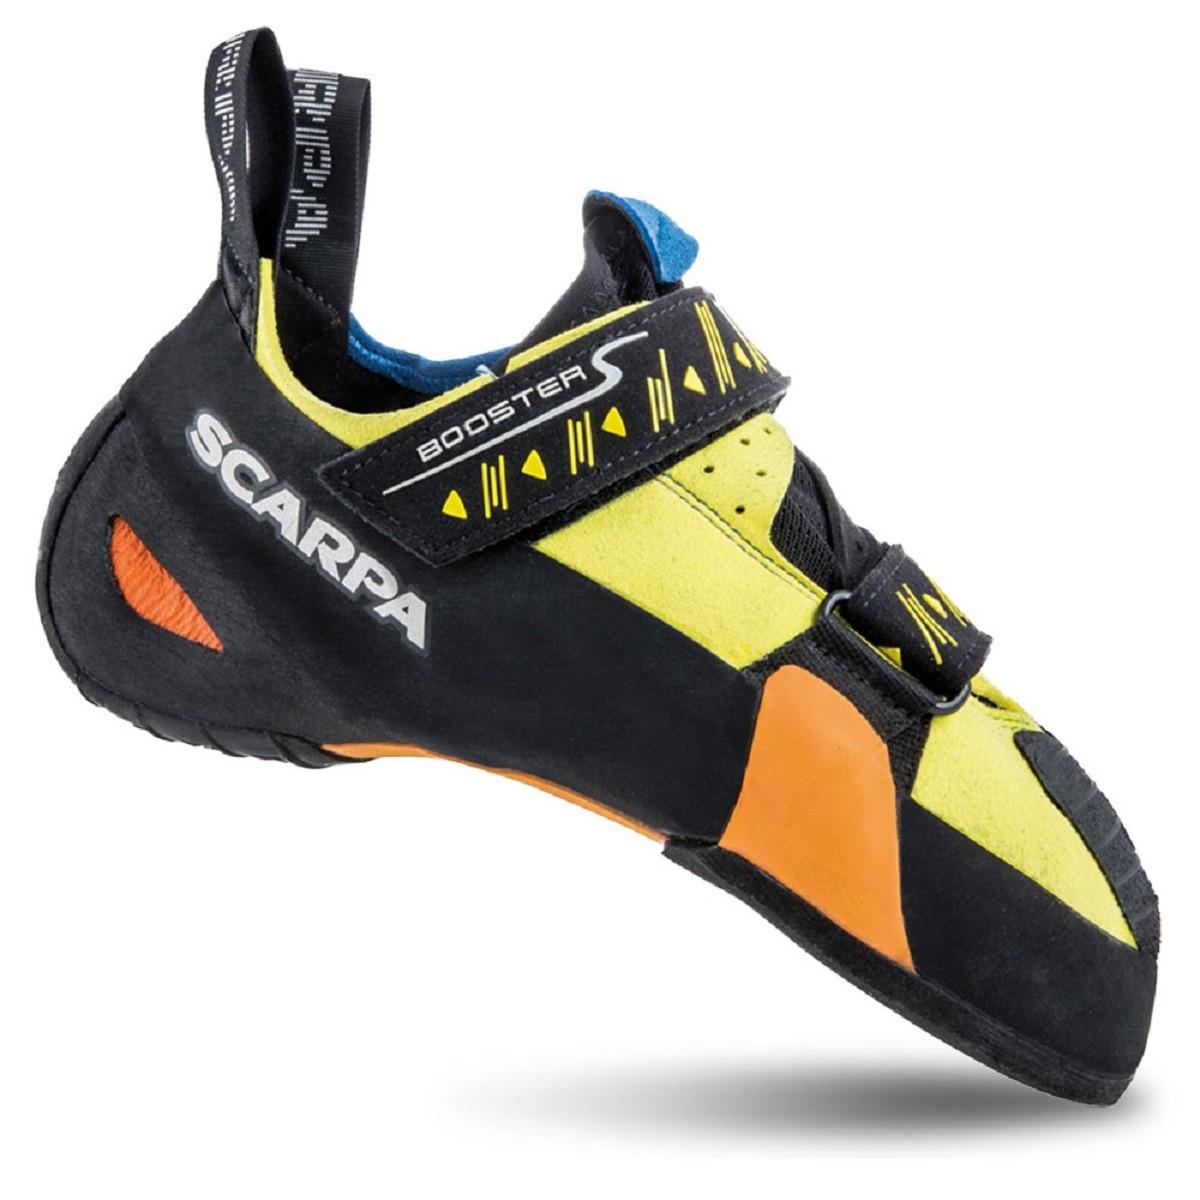 SCARPA modello BOOSTER S <strong>ULTIMO PAIO!!!!!</strong> <del>€ 145,00</del>